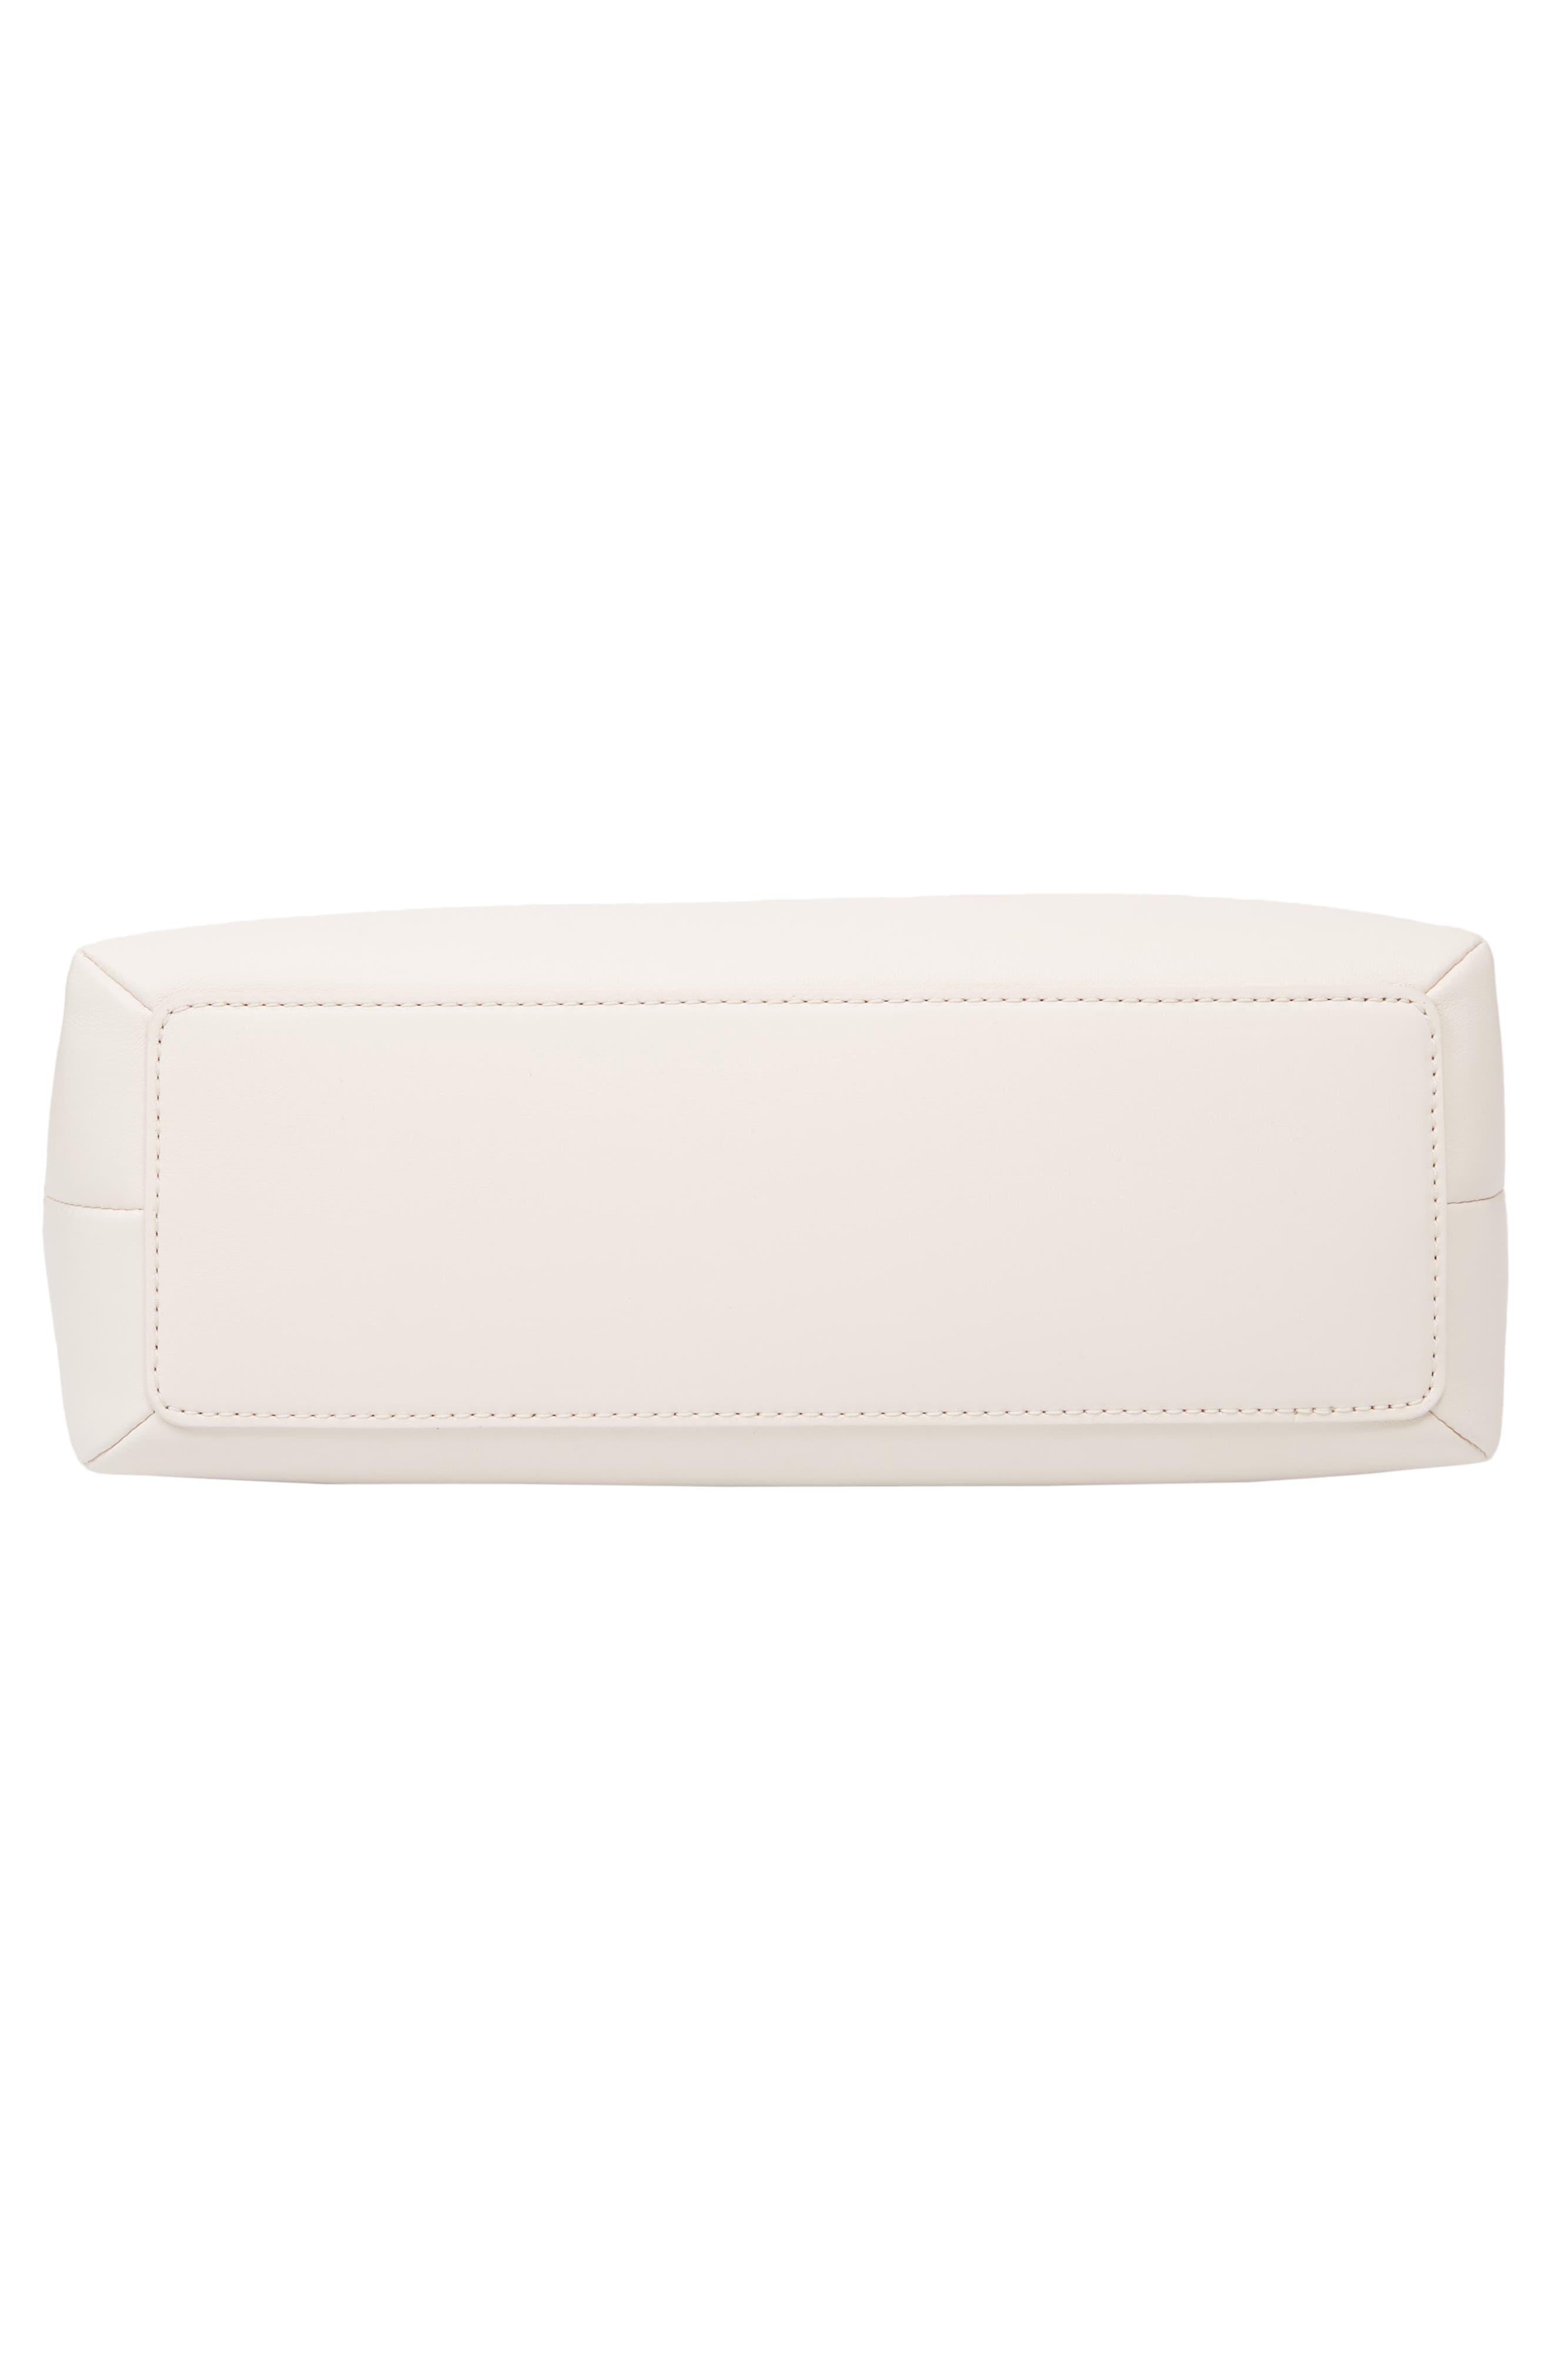 emerson place lorie quilted leather shoulder bag,                             Alternate thumbnail 3, color,                             Bleach Bone